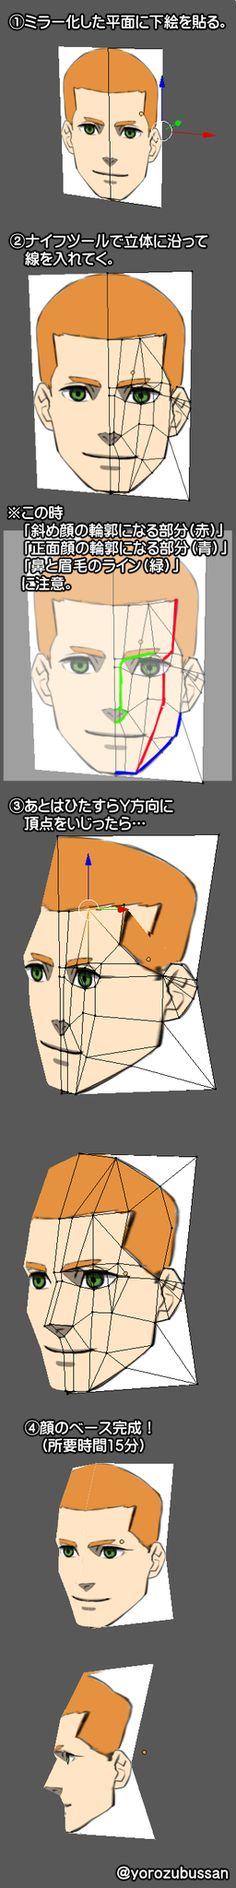 3d Model Character, Character Modeling, Character Art, Character Design, Maya Modeling, Modeling Tips, Polygon Modeling, 3ds Max Tutorials, Animation Tutorial